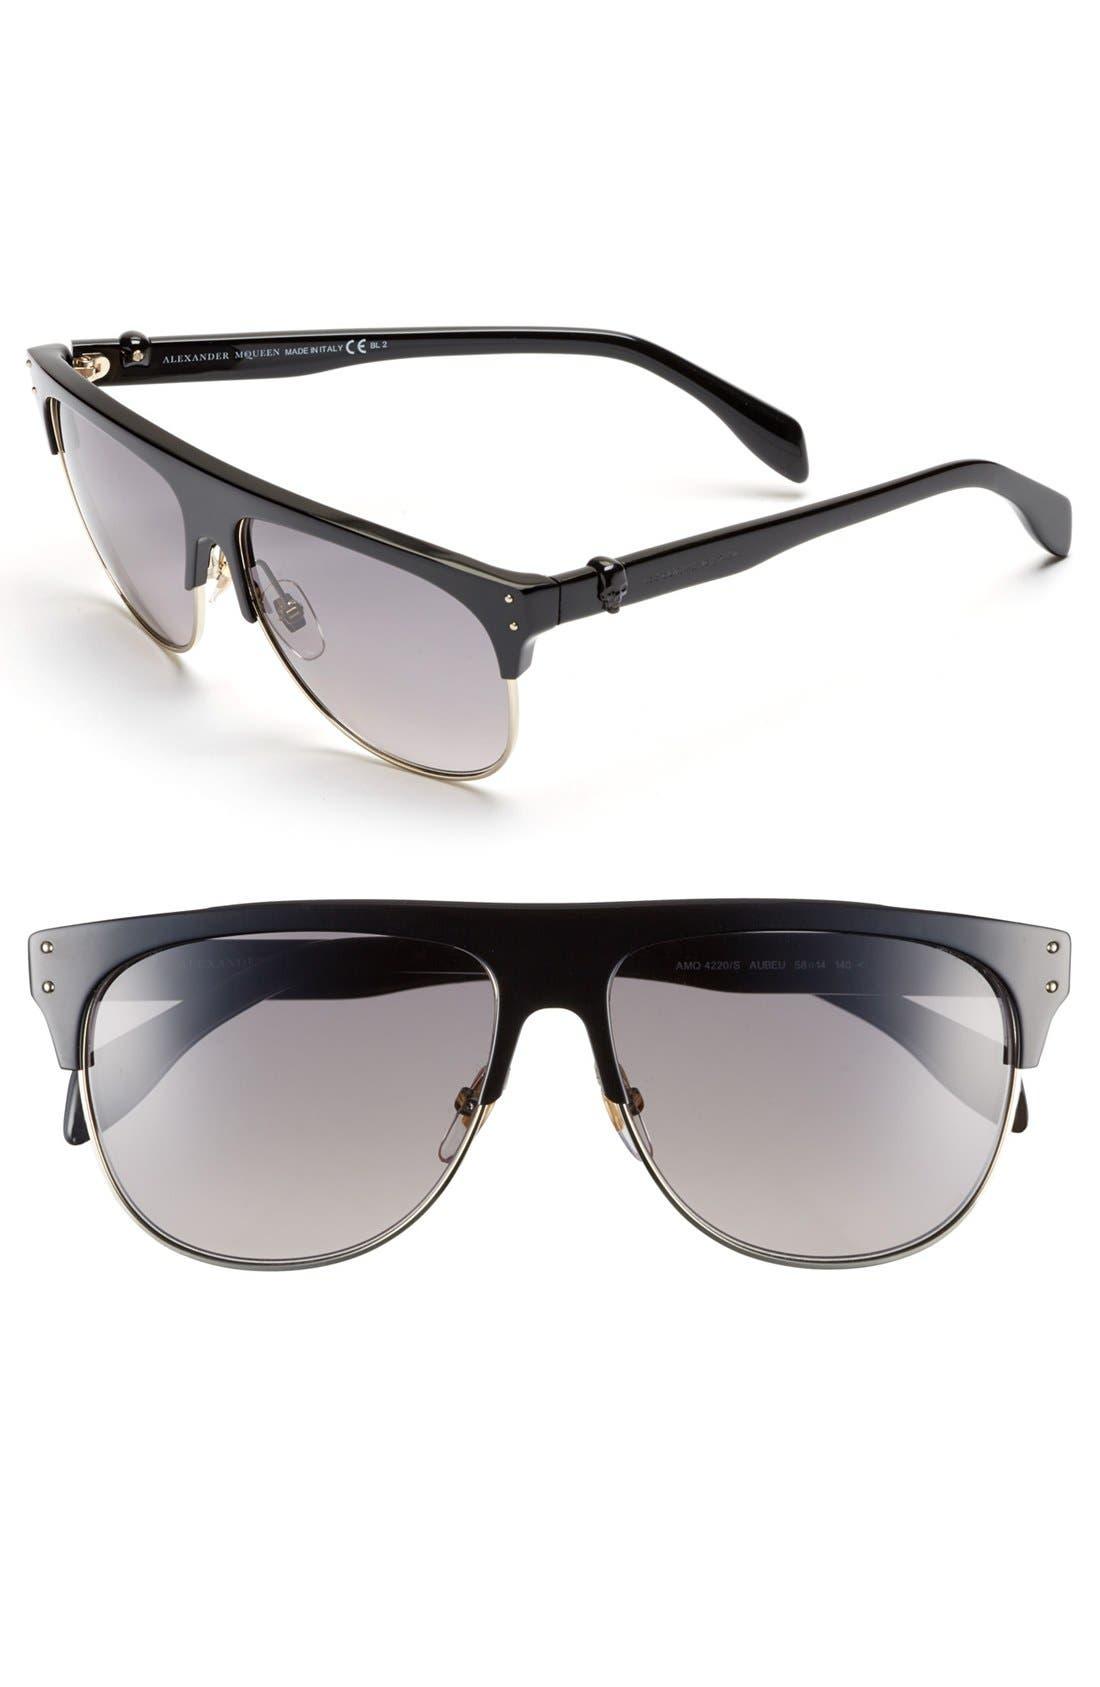 Main Image - Alexander McQueen 58mm Retro Sunglasses